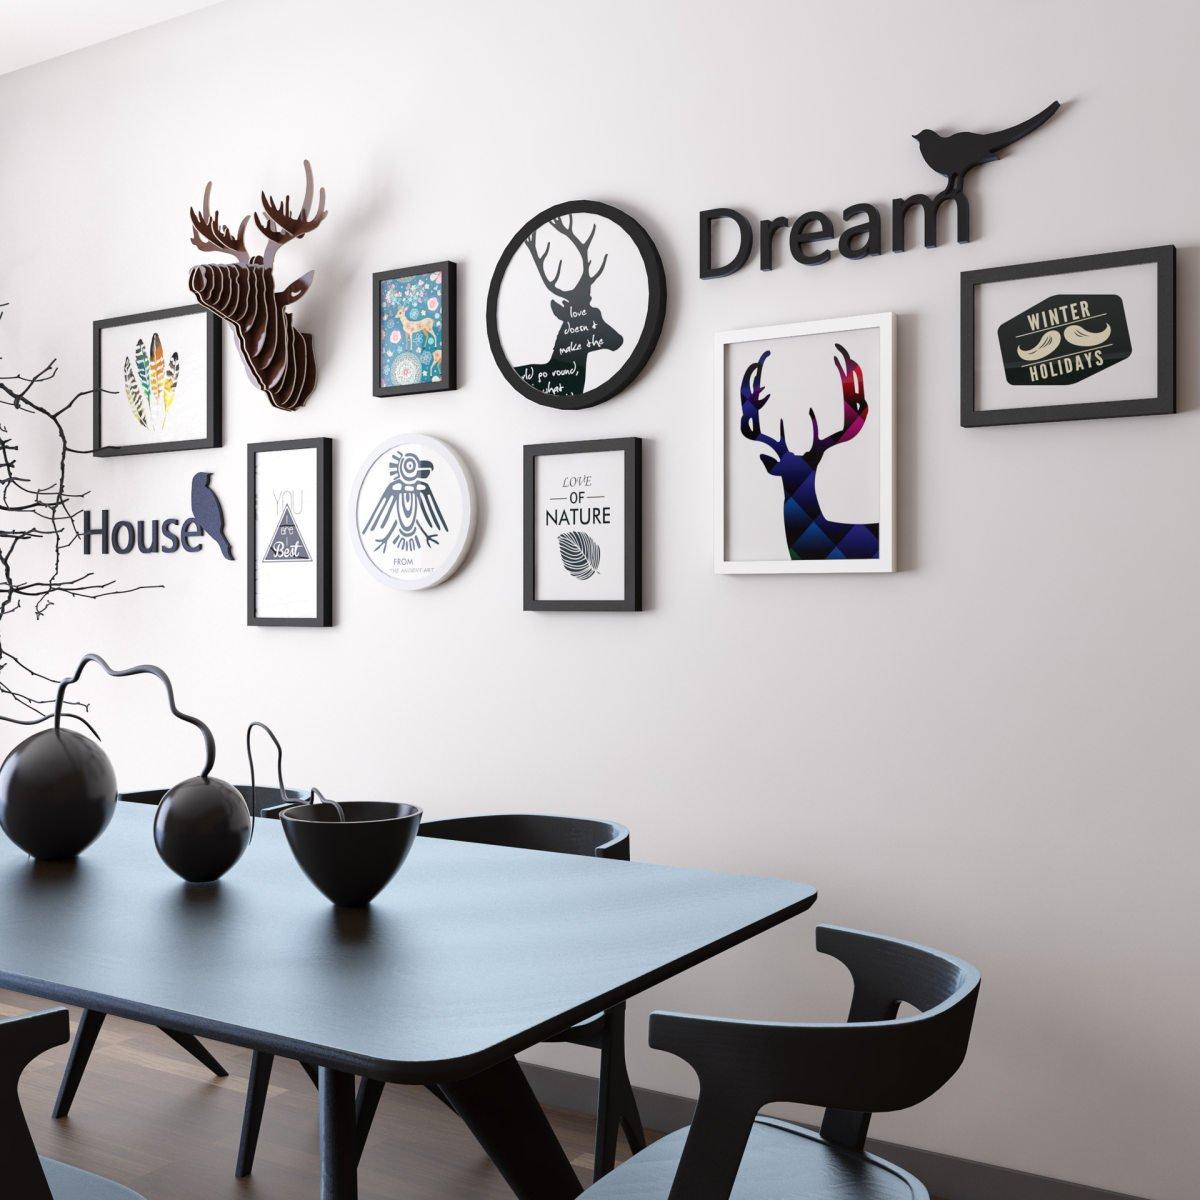 Nwn ホームデコラティブペインティングフォトウォール、リビングルームベッドルームフォトフレームコンビネーション、ブラックホワイトアートクリエイティブ壁画 ブラック 5698845  ブラック&ホワイト B07JP4JDTX